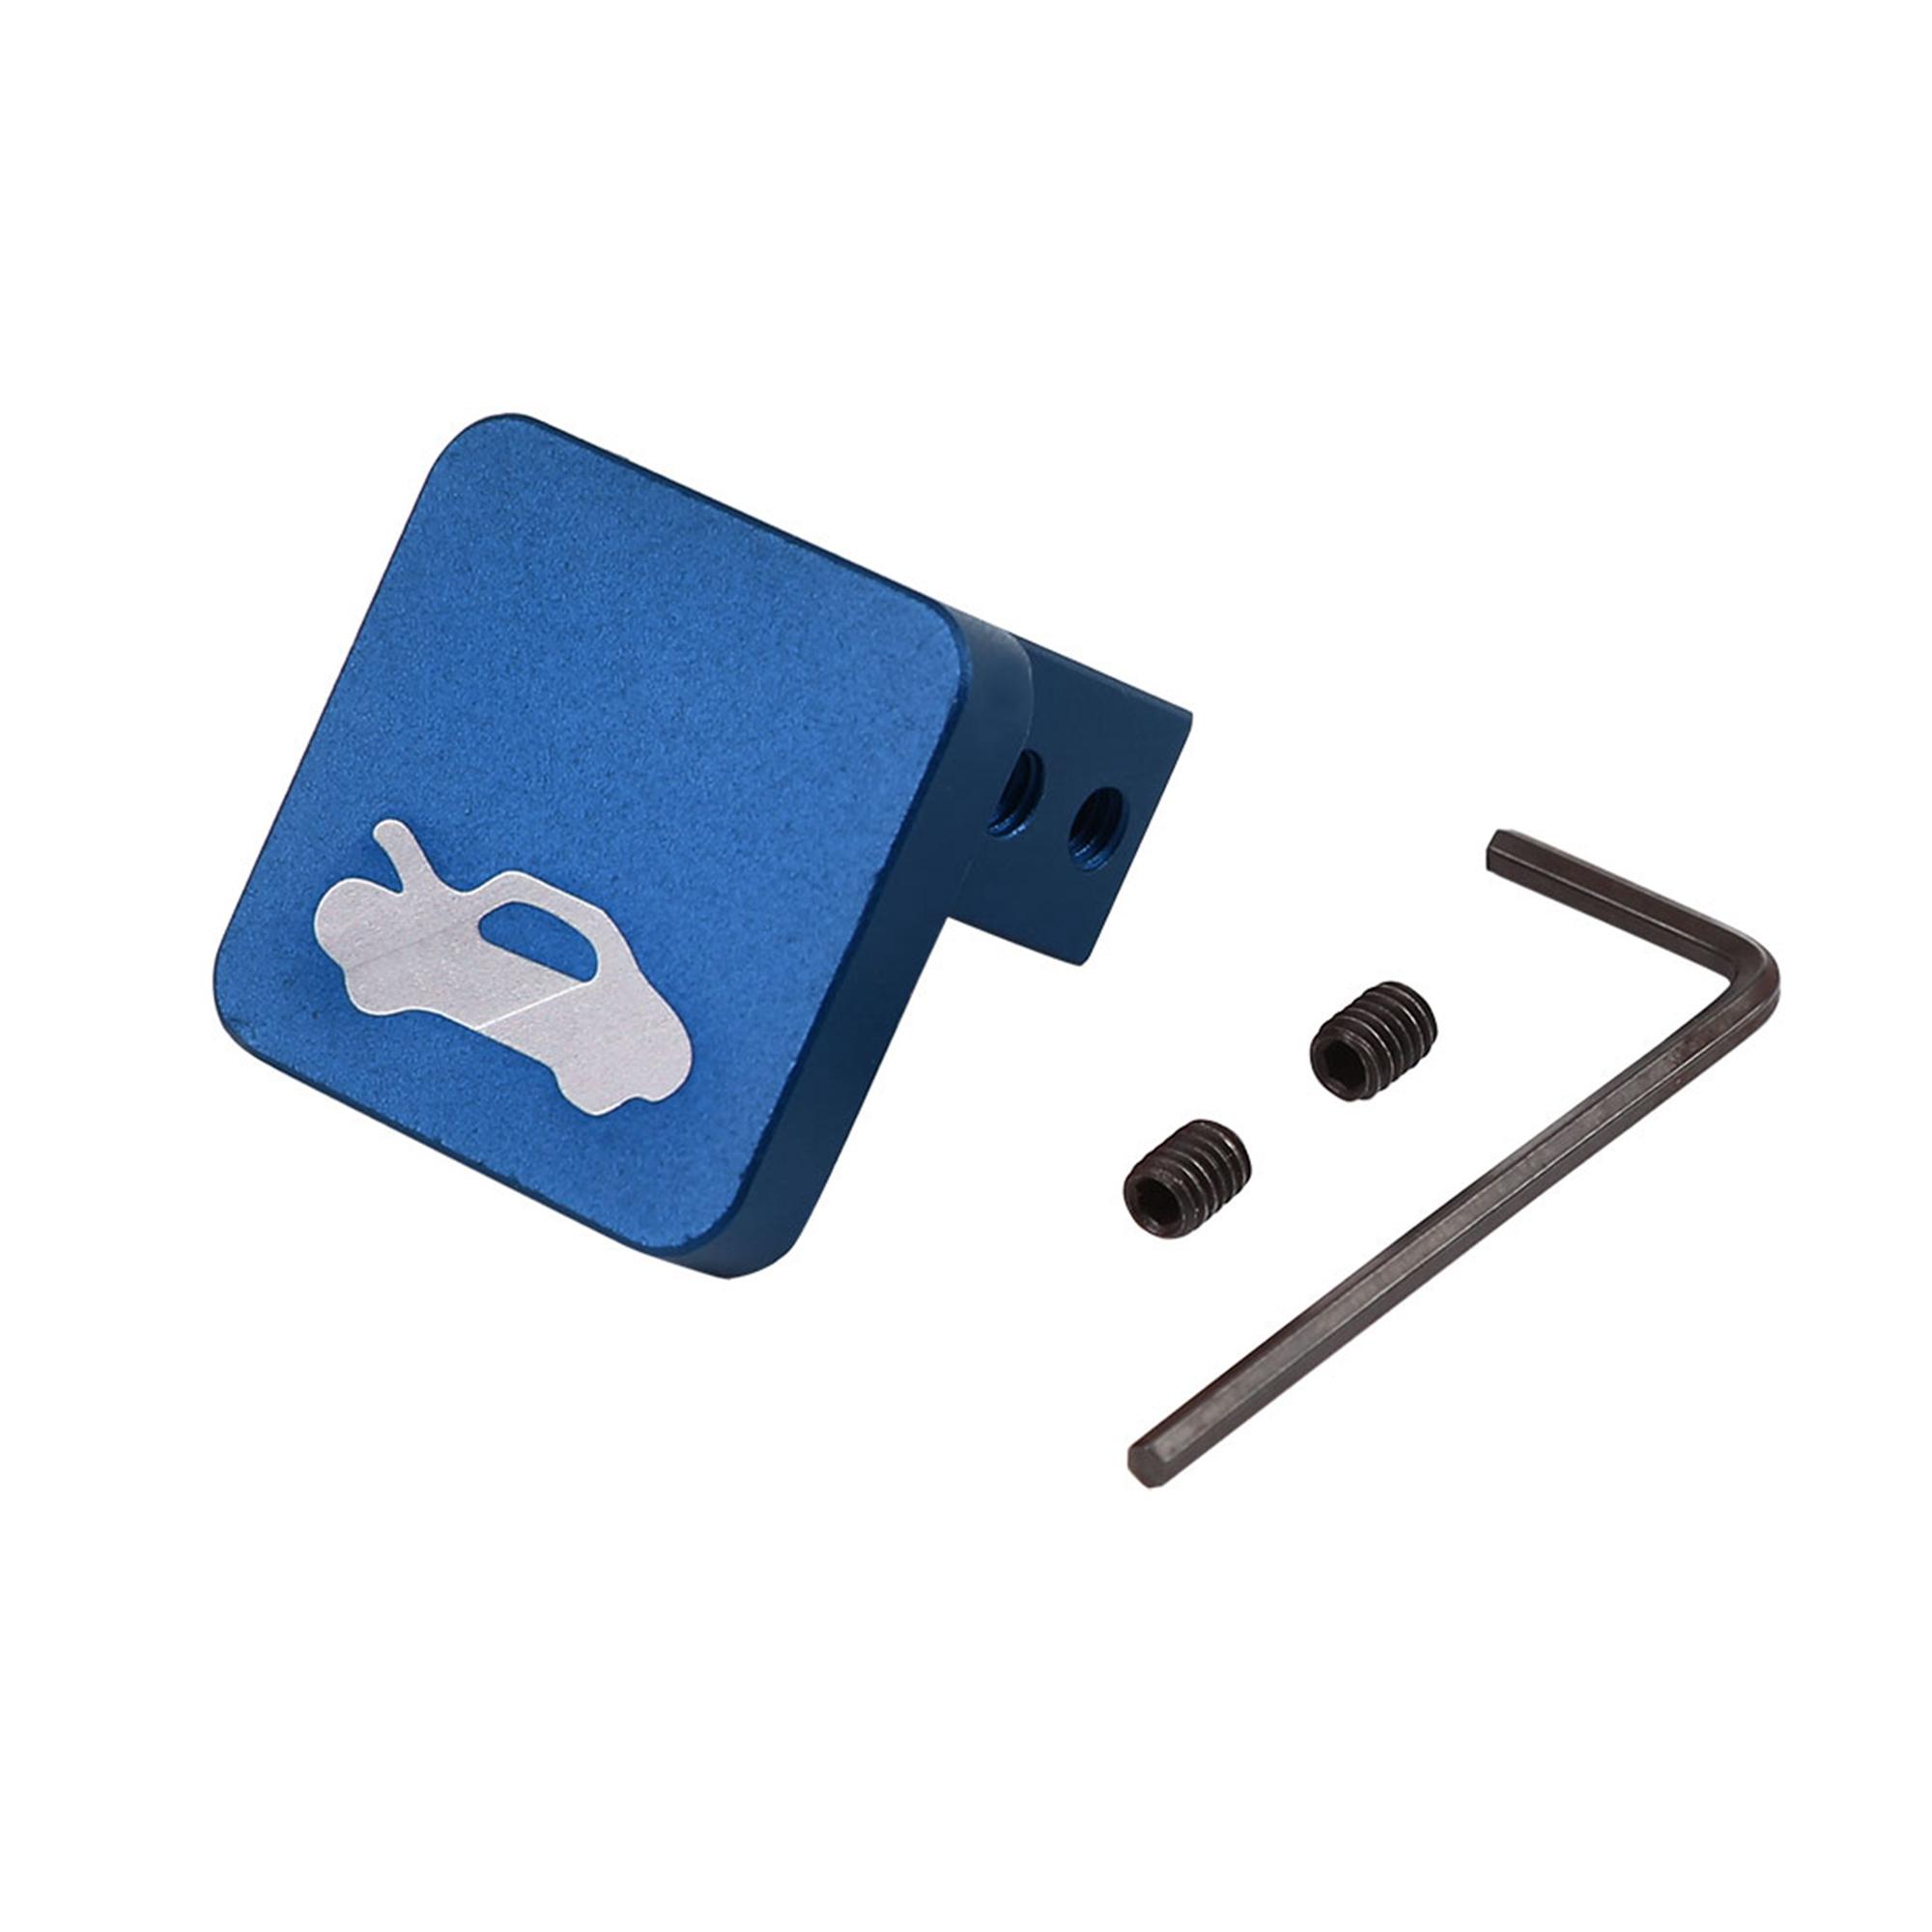 Hood Release Latch Handle Repair Kit Blue for Honda Civic CR-V Ridgeline Element